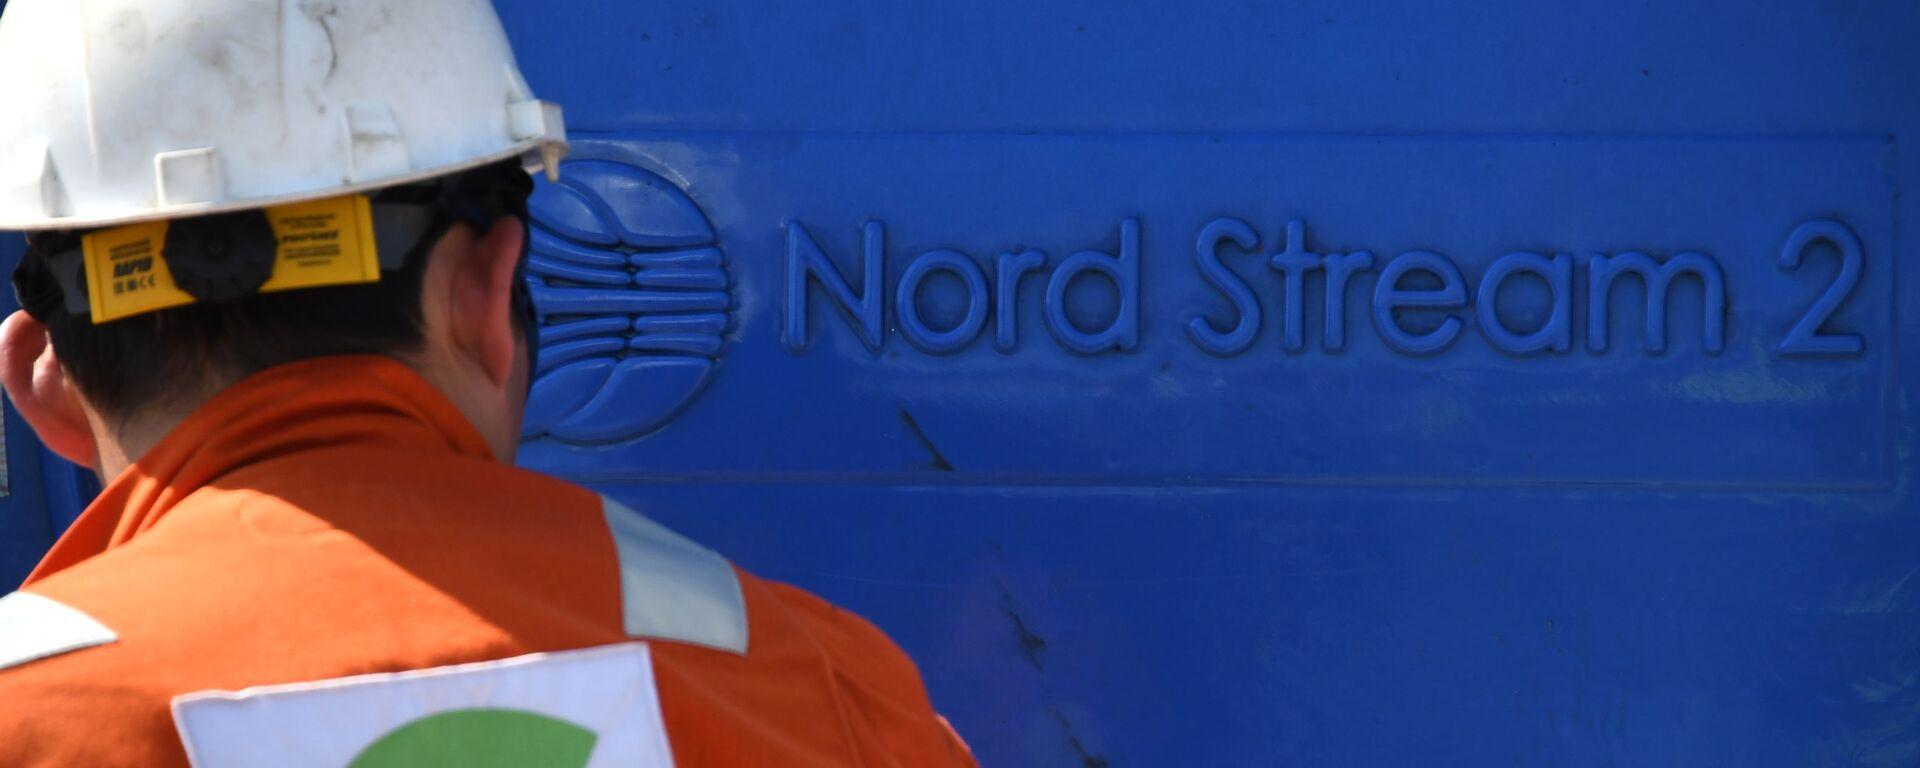 Budowa Nord Stream 2 - Sputnik Polska, 1920, 25.07.2021